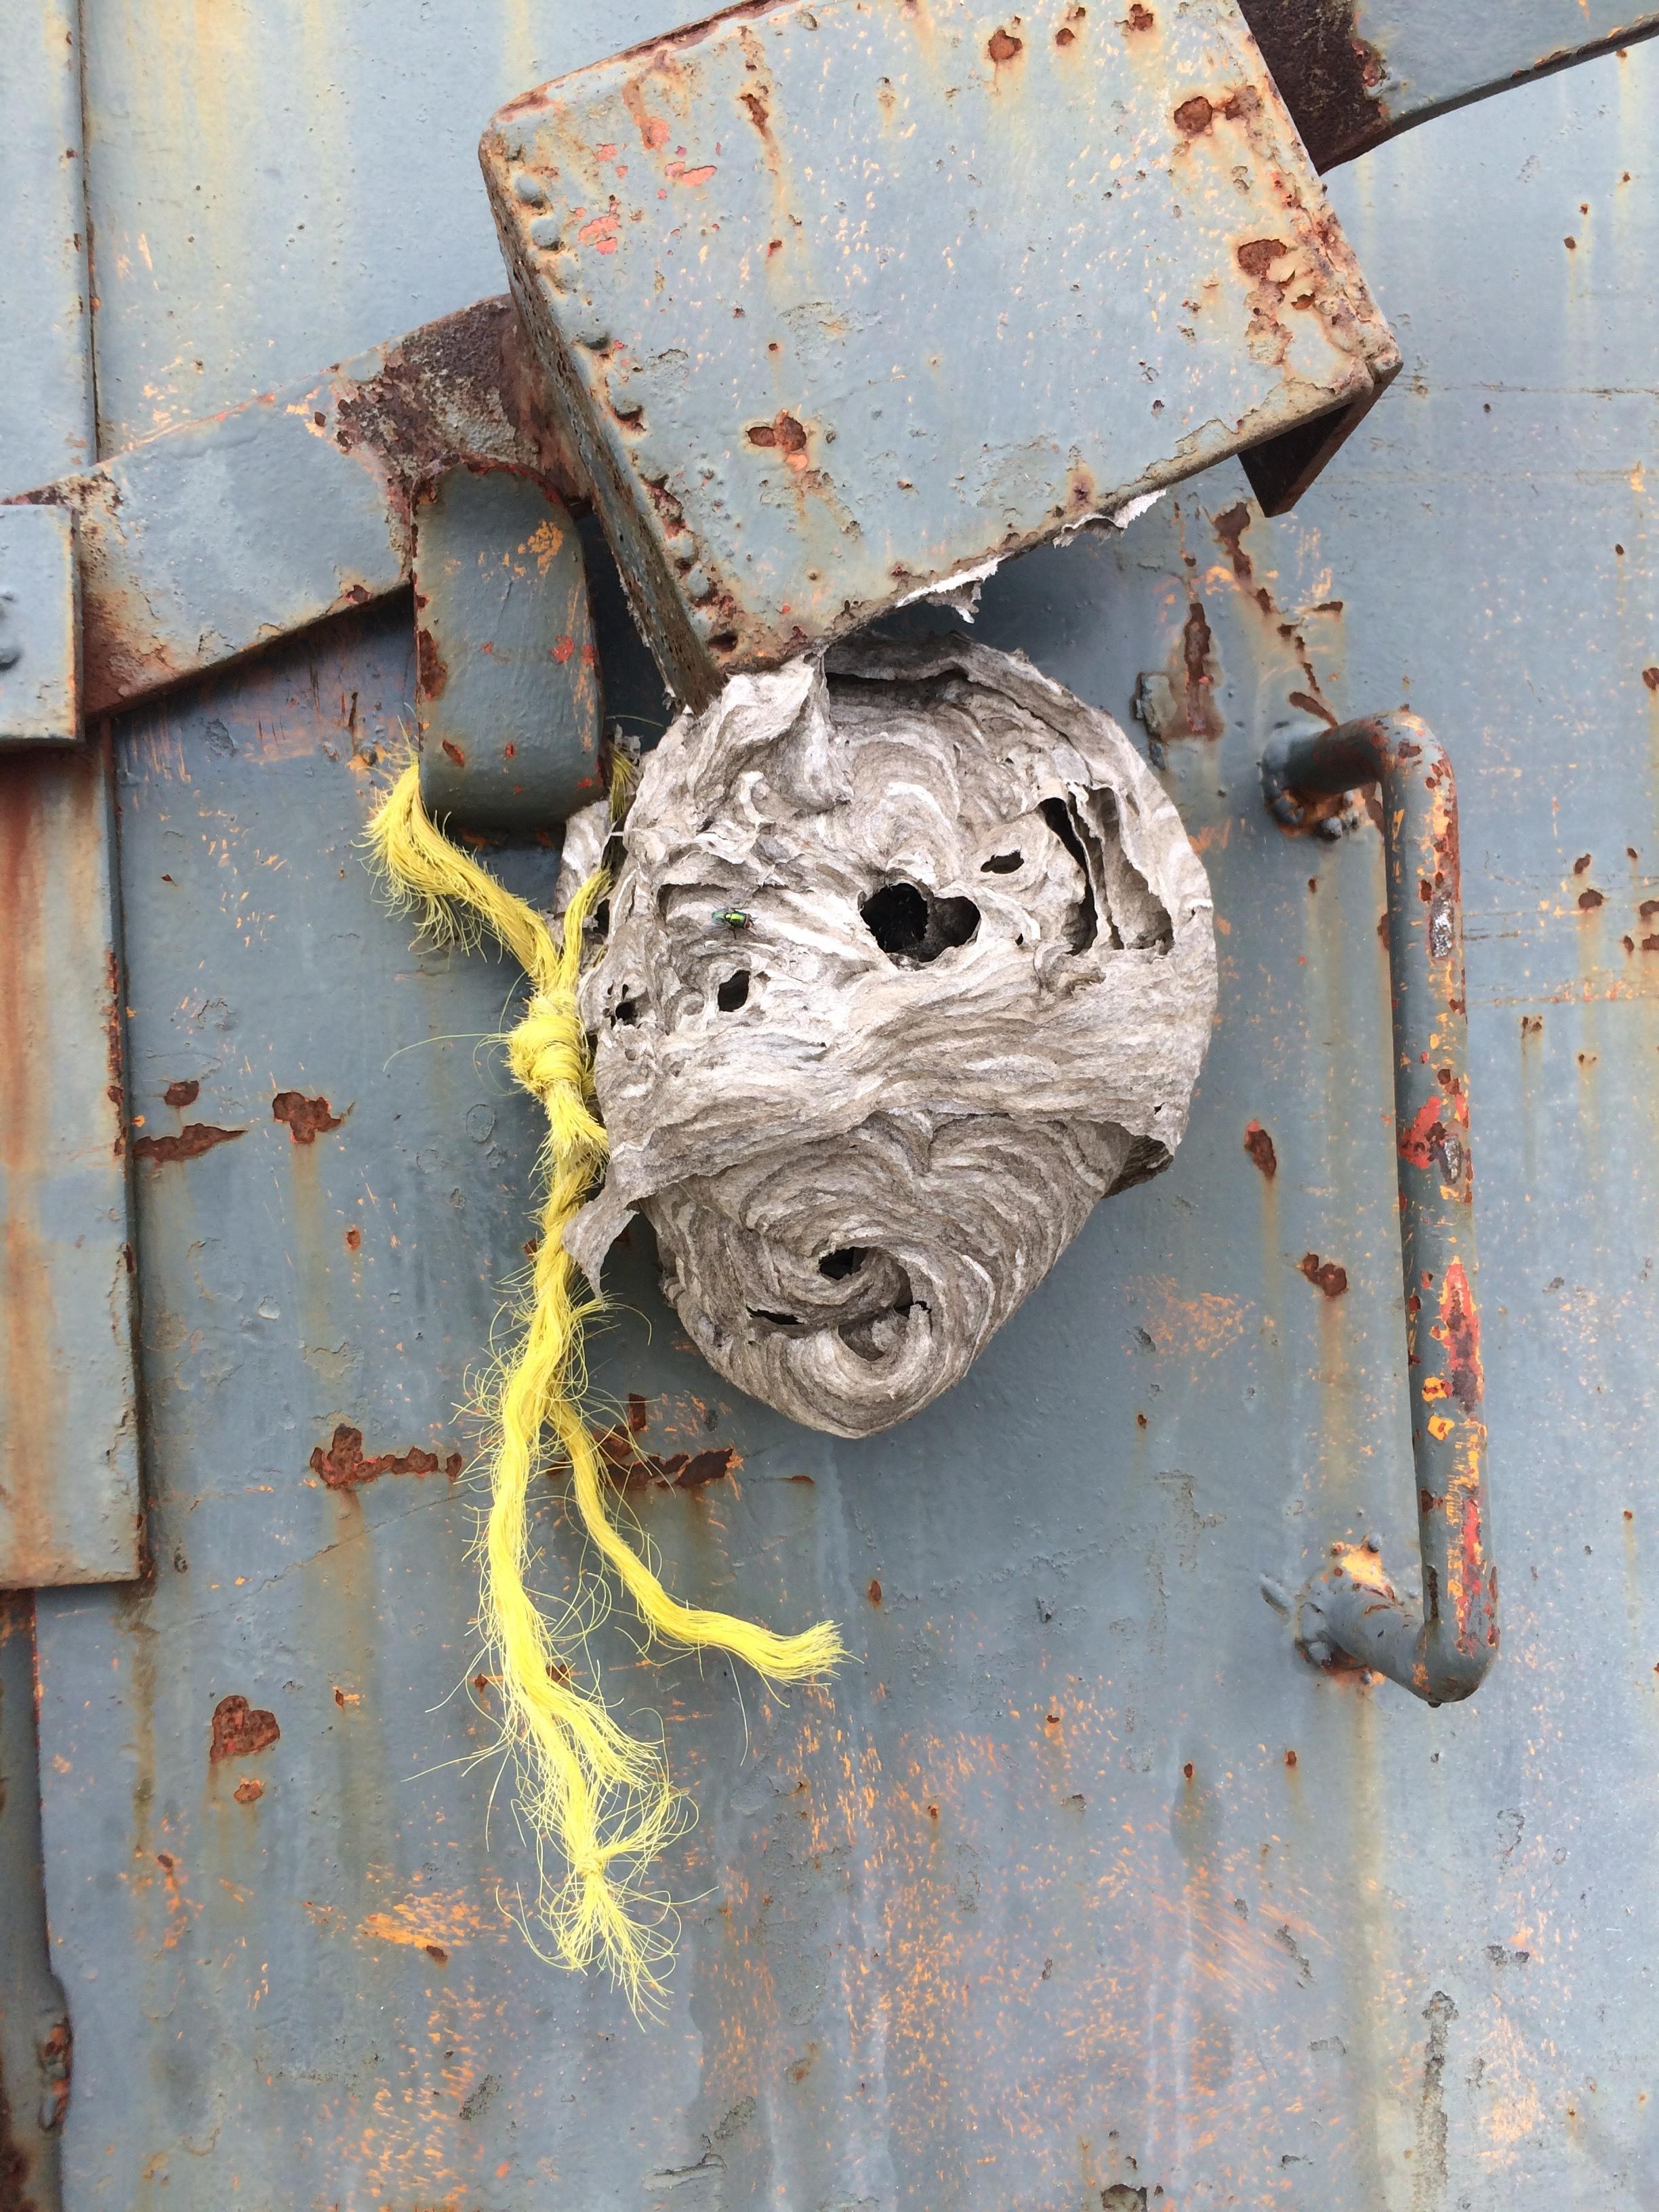 Paper Wasps - Spray Lake Watersports Park - July 26/18